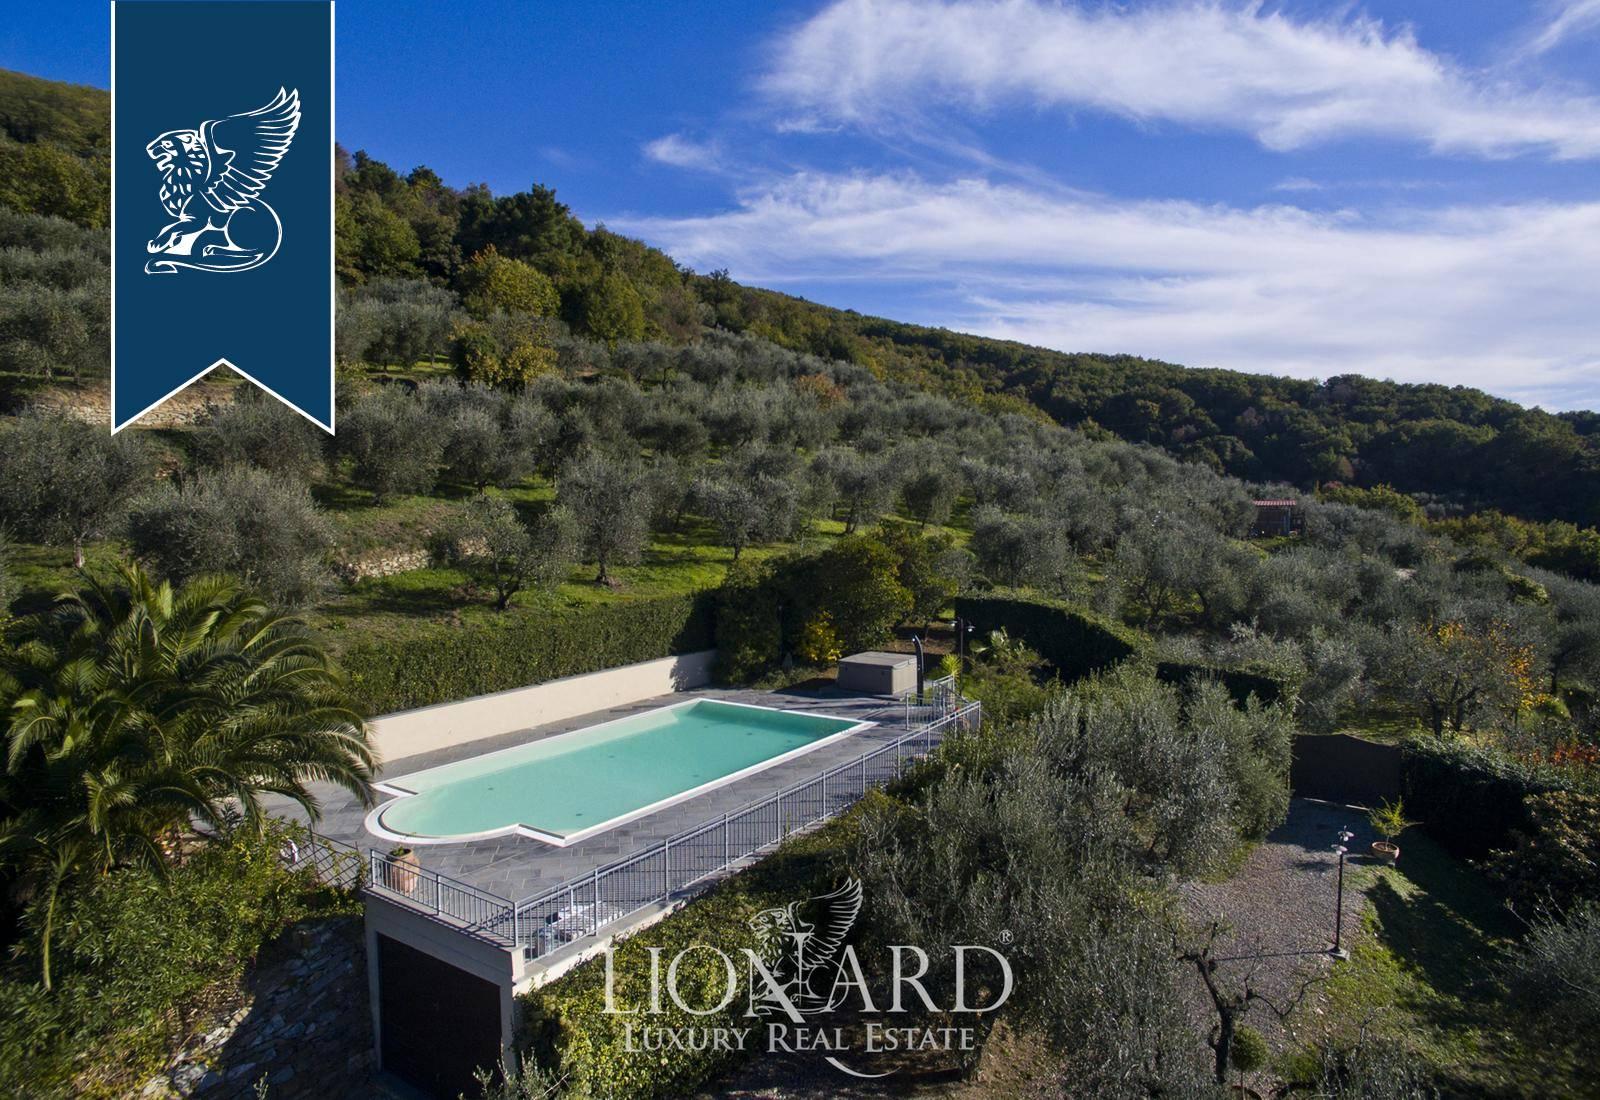 Agriturismo in Vendita a Monsummano Terme: 0 locali, 700 mq - Foto 6